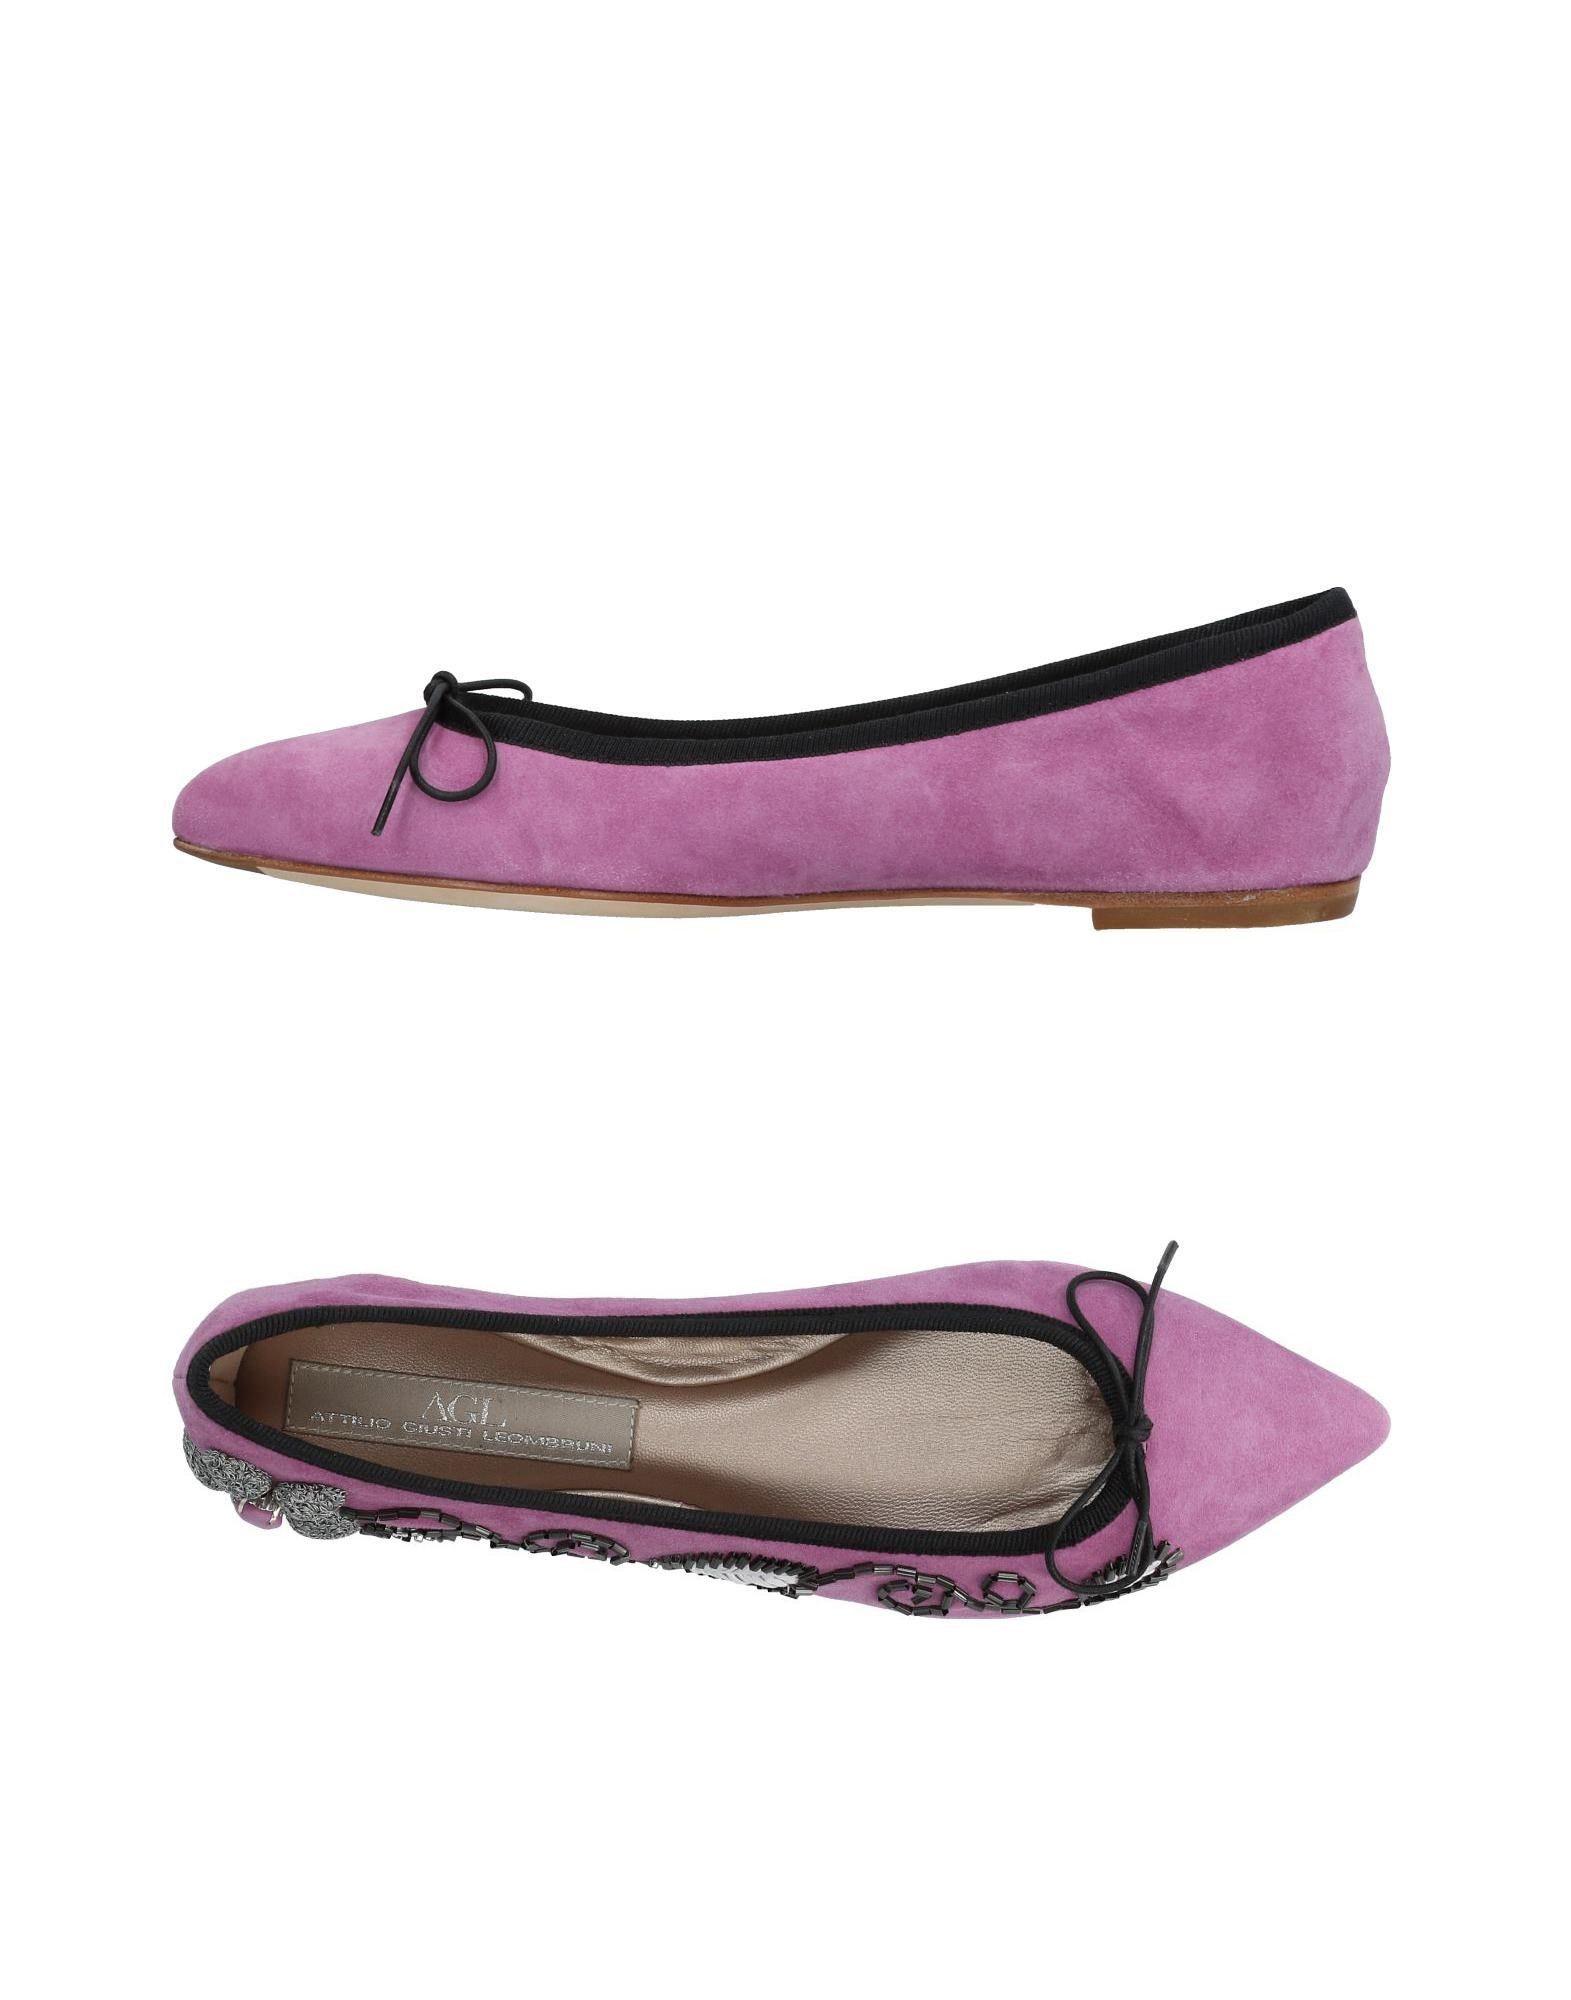 d0b9dcf50ce239 Agl Damen Attilio Giusti Leombruni Ballerinas Damen Agl 11413627CX Gute  Qualität beliebte Schuhe b55756